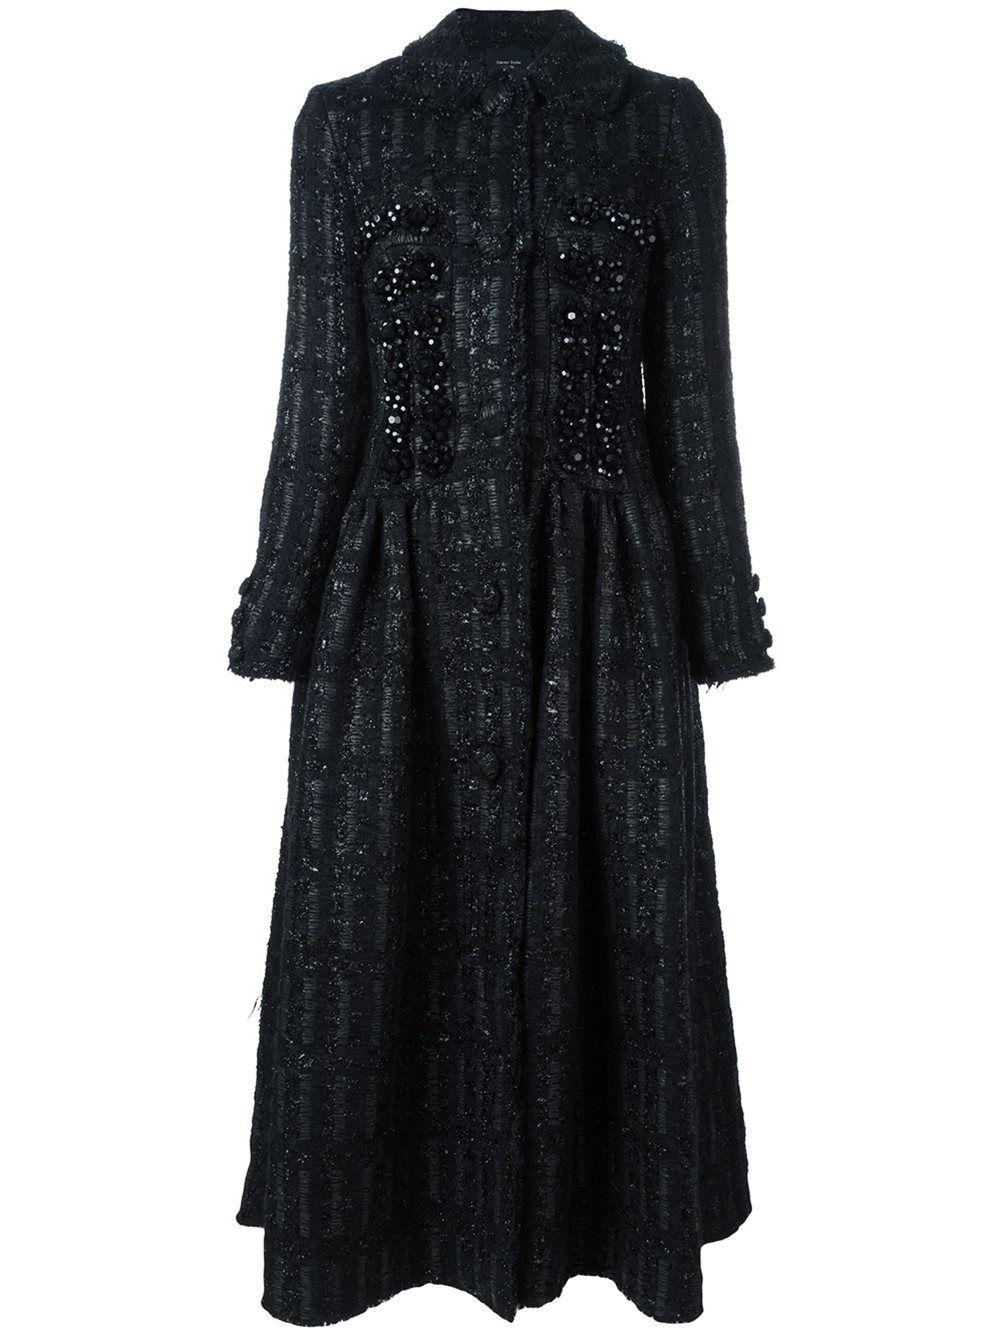 cb0f28489c1ce Women's Black Embellished Princess Coat   Closet   Pinterest   Coat ...